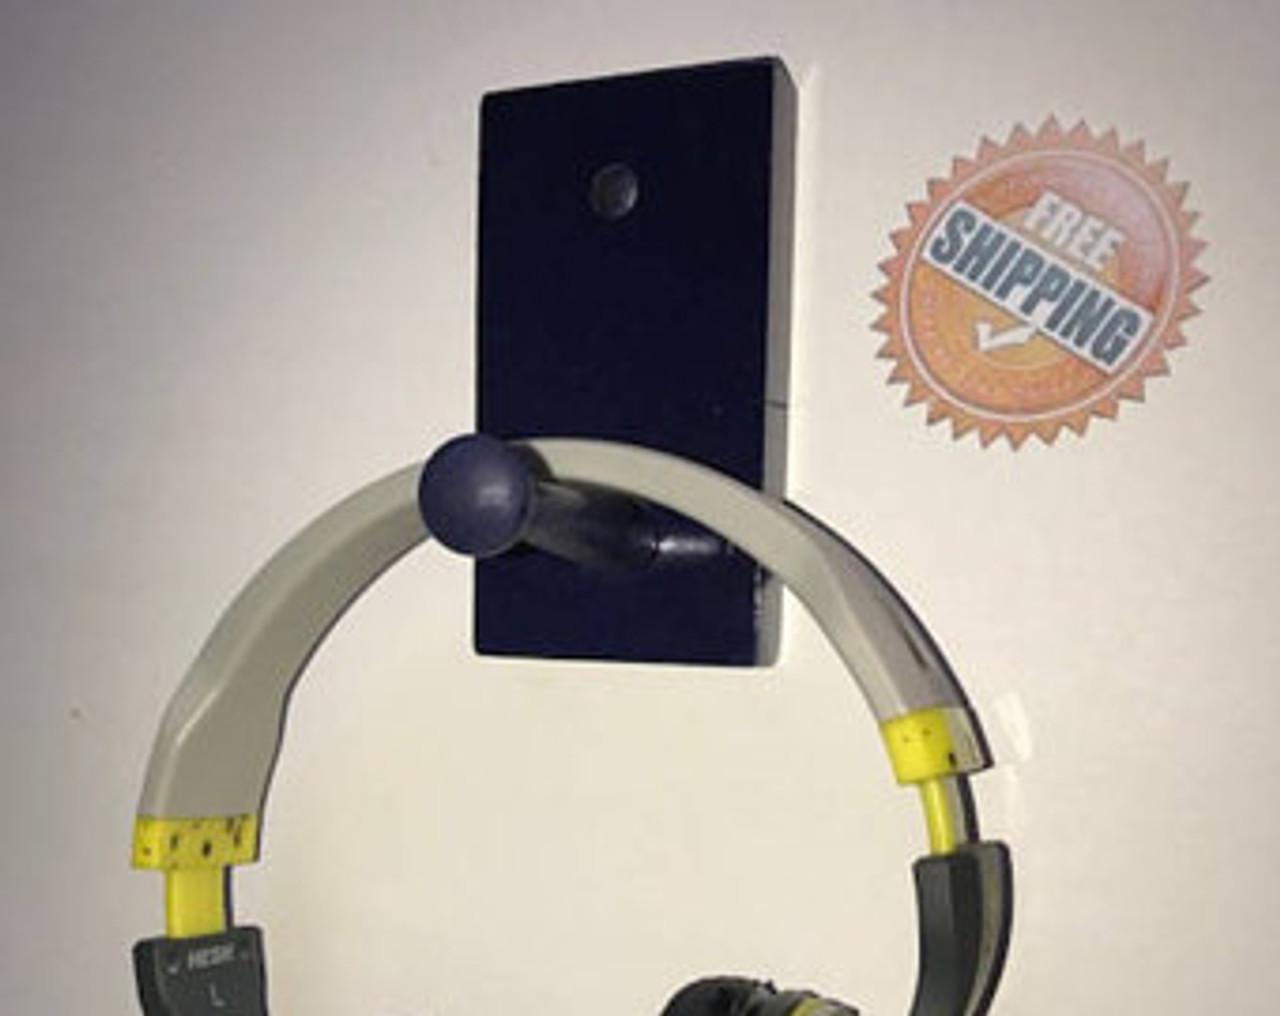 Utility Hook Rack Display Holder Single Peg Blue Hat Cap Headphones Premium Wood